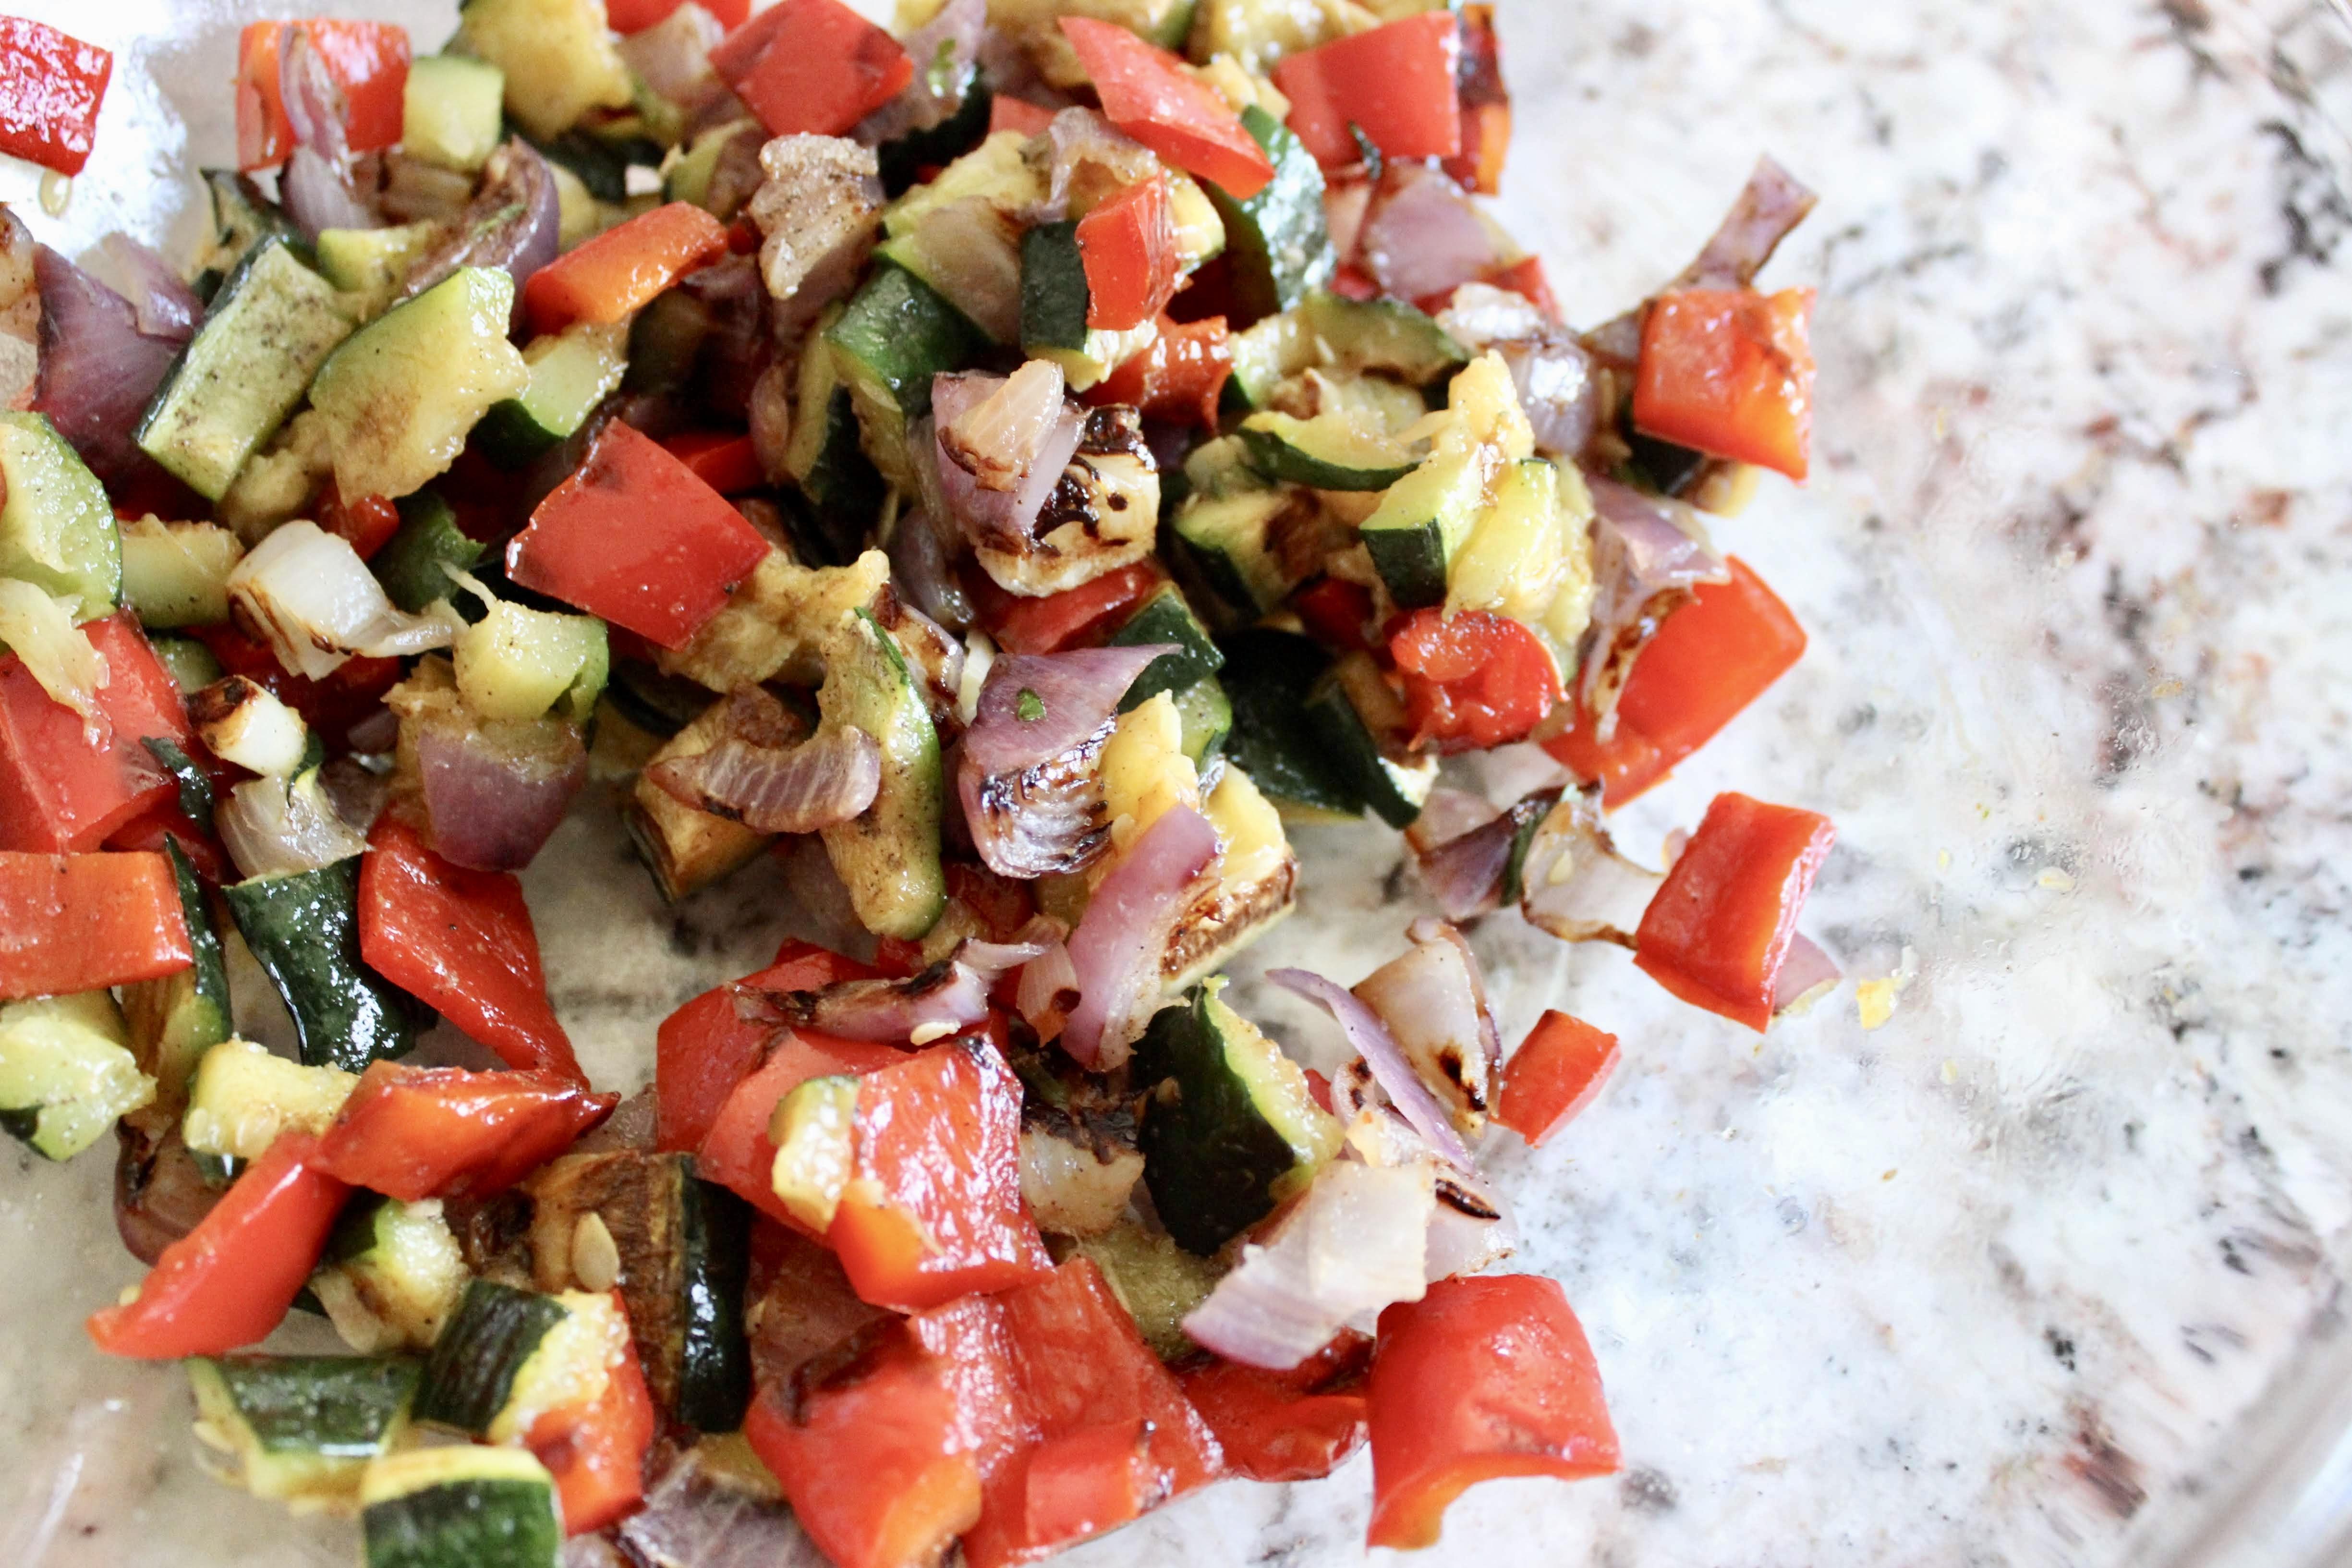 Grilled Vegetable Chimichurri Pasta Salad